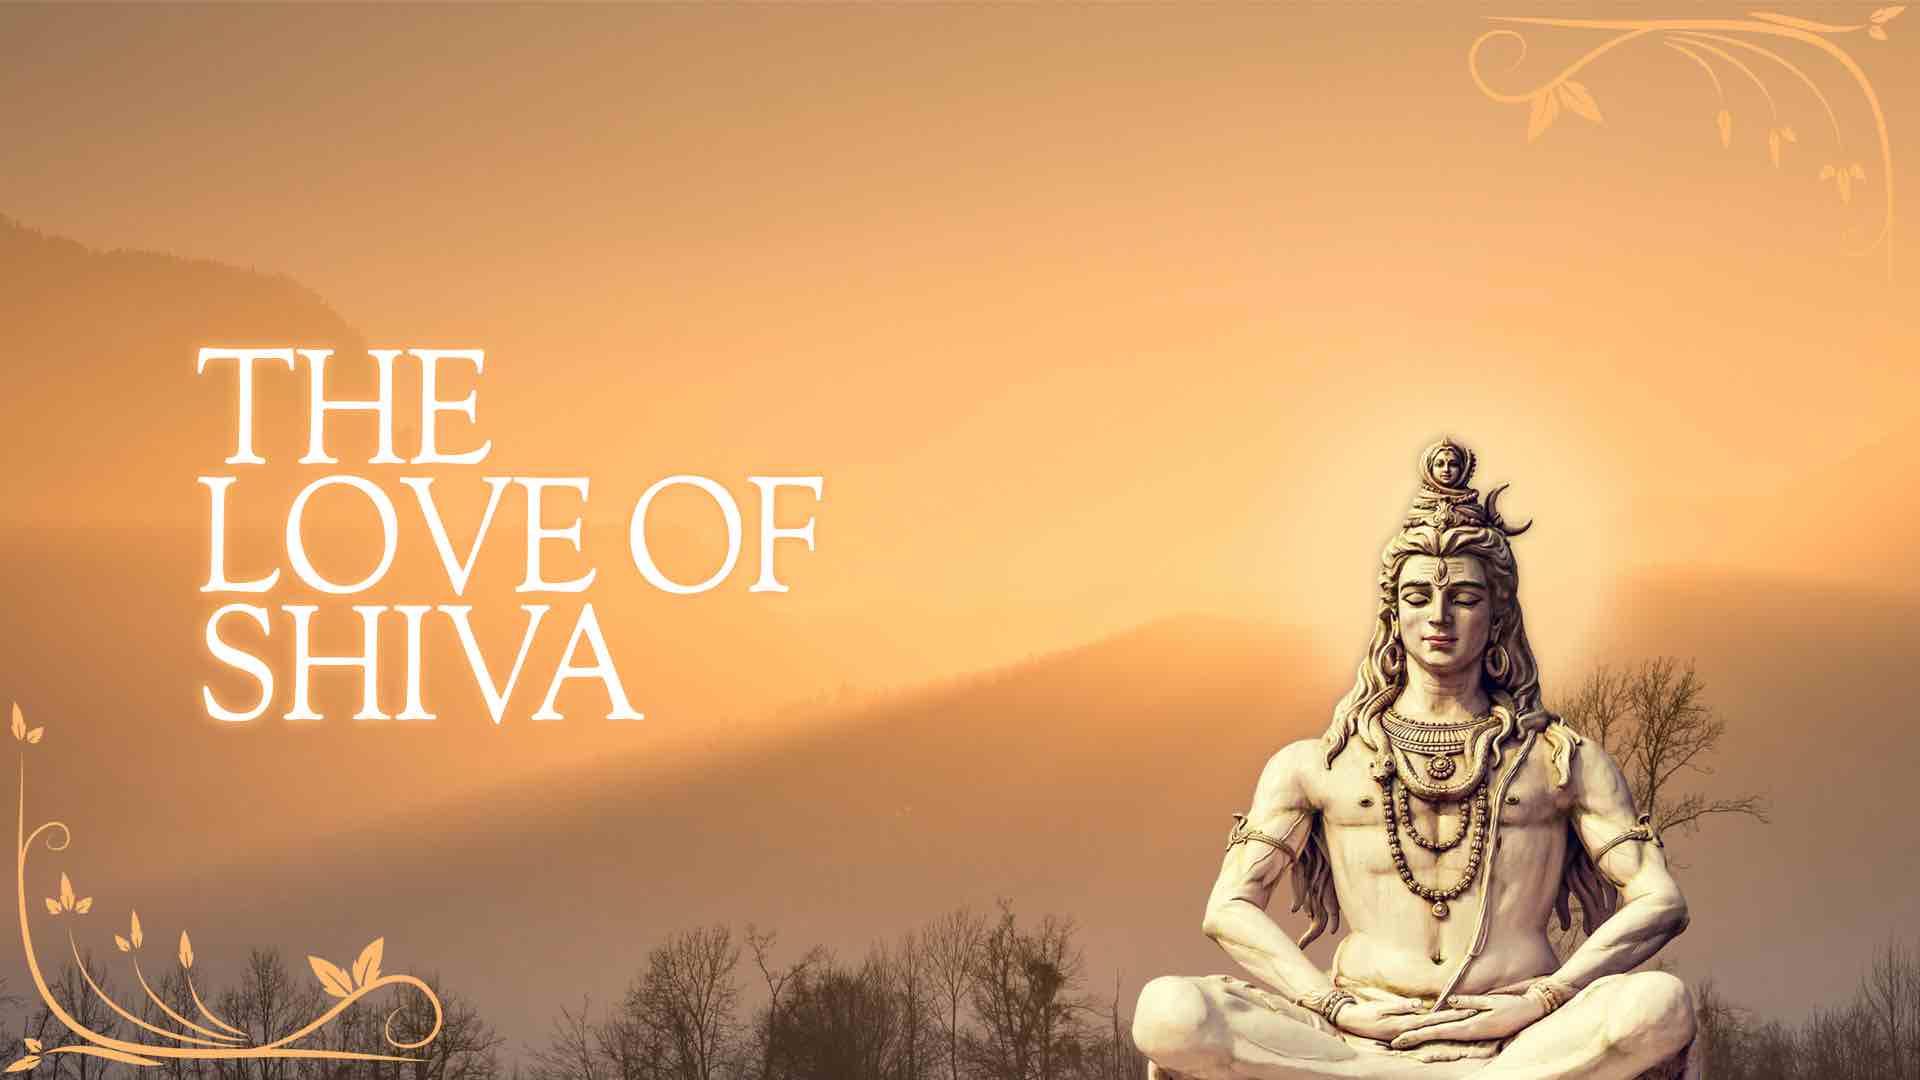 The Love Of Shiva Vikas Varma Low Res